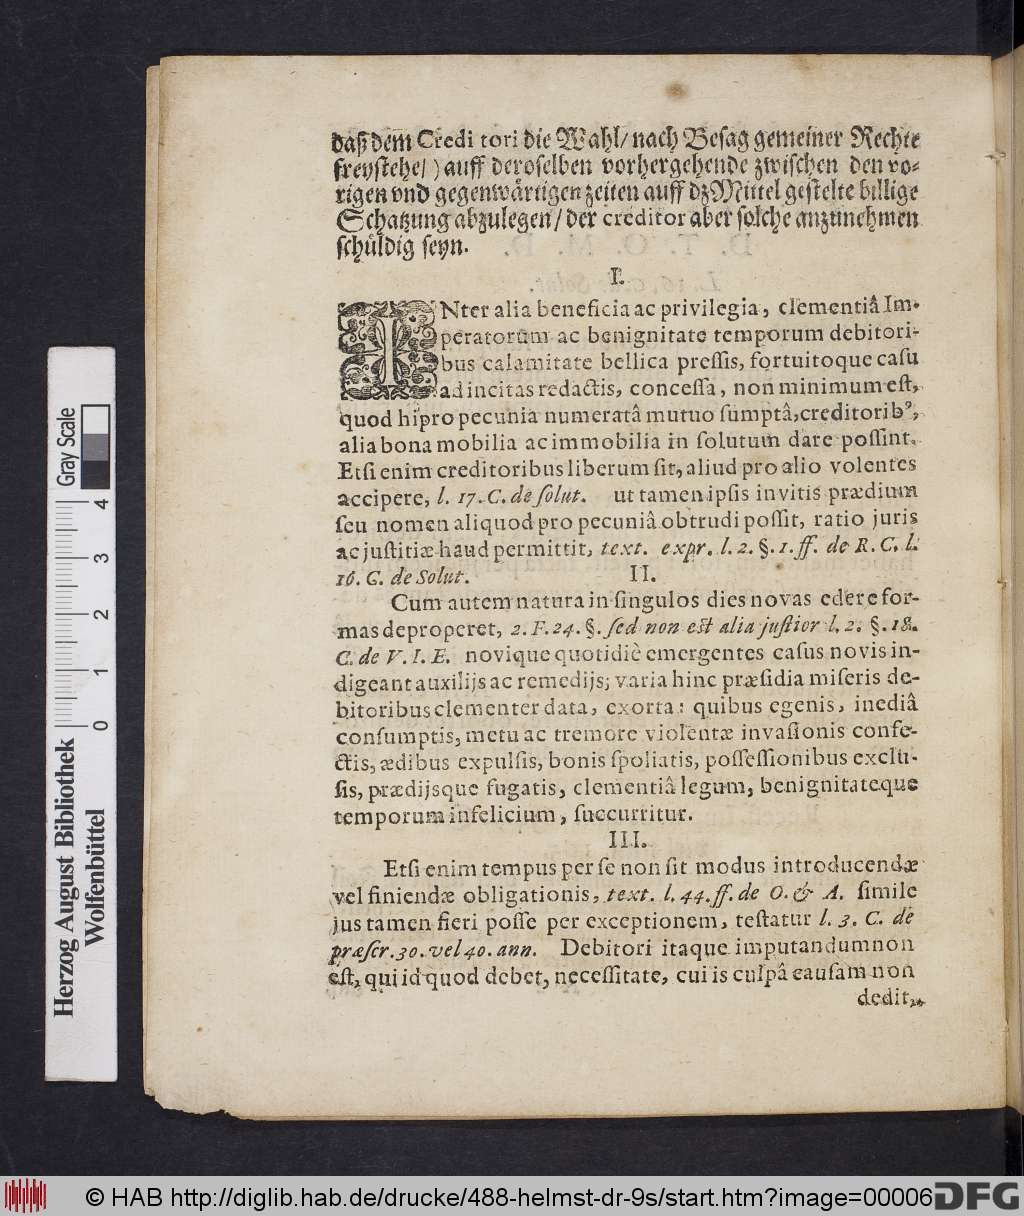 http://diglib.hab.de/drucke/488-helmst-dr-9s/00006.jpg